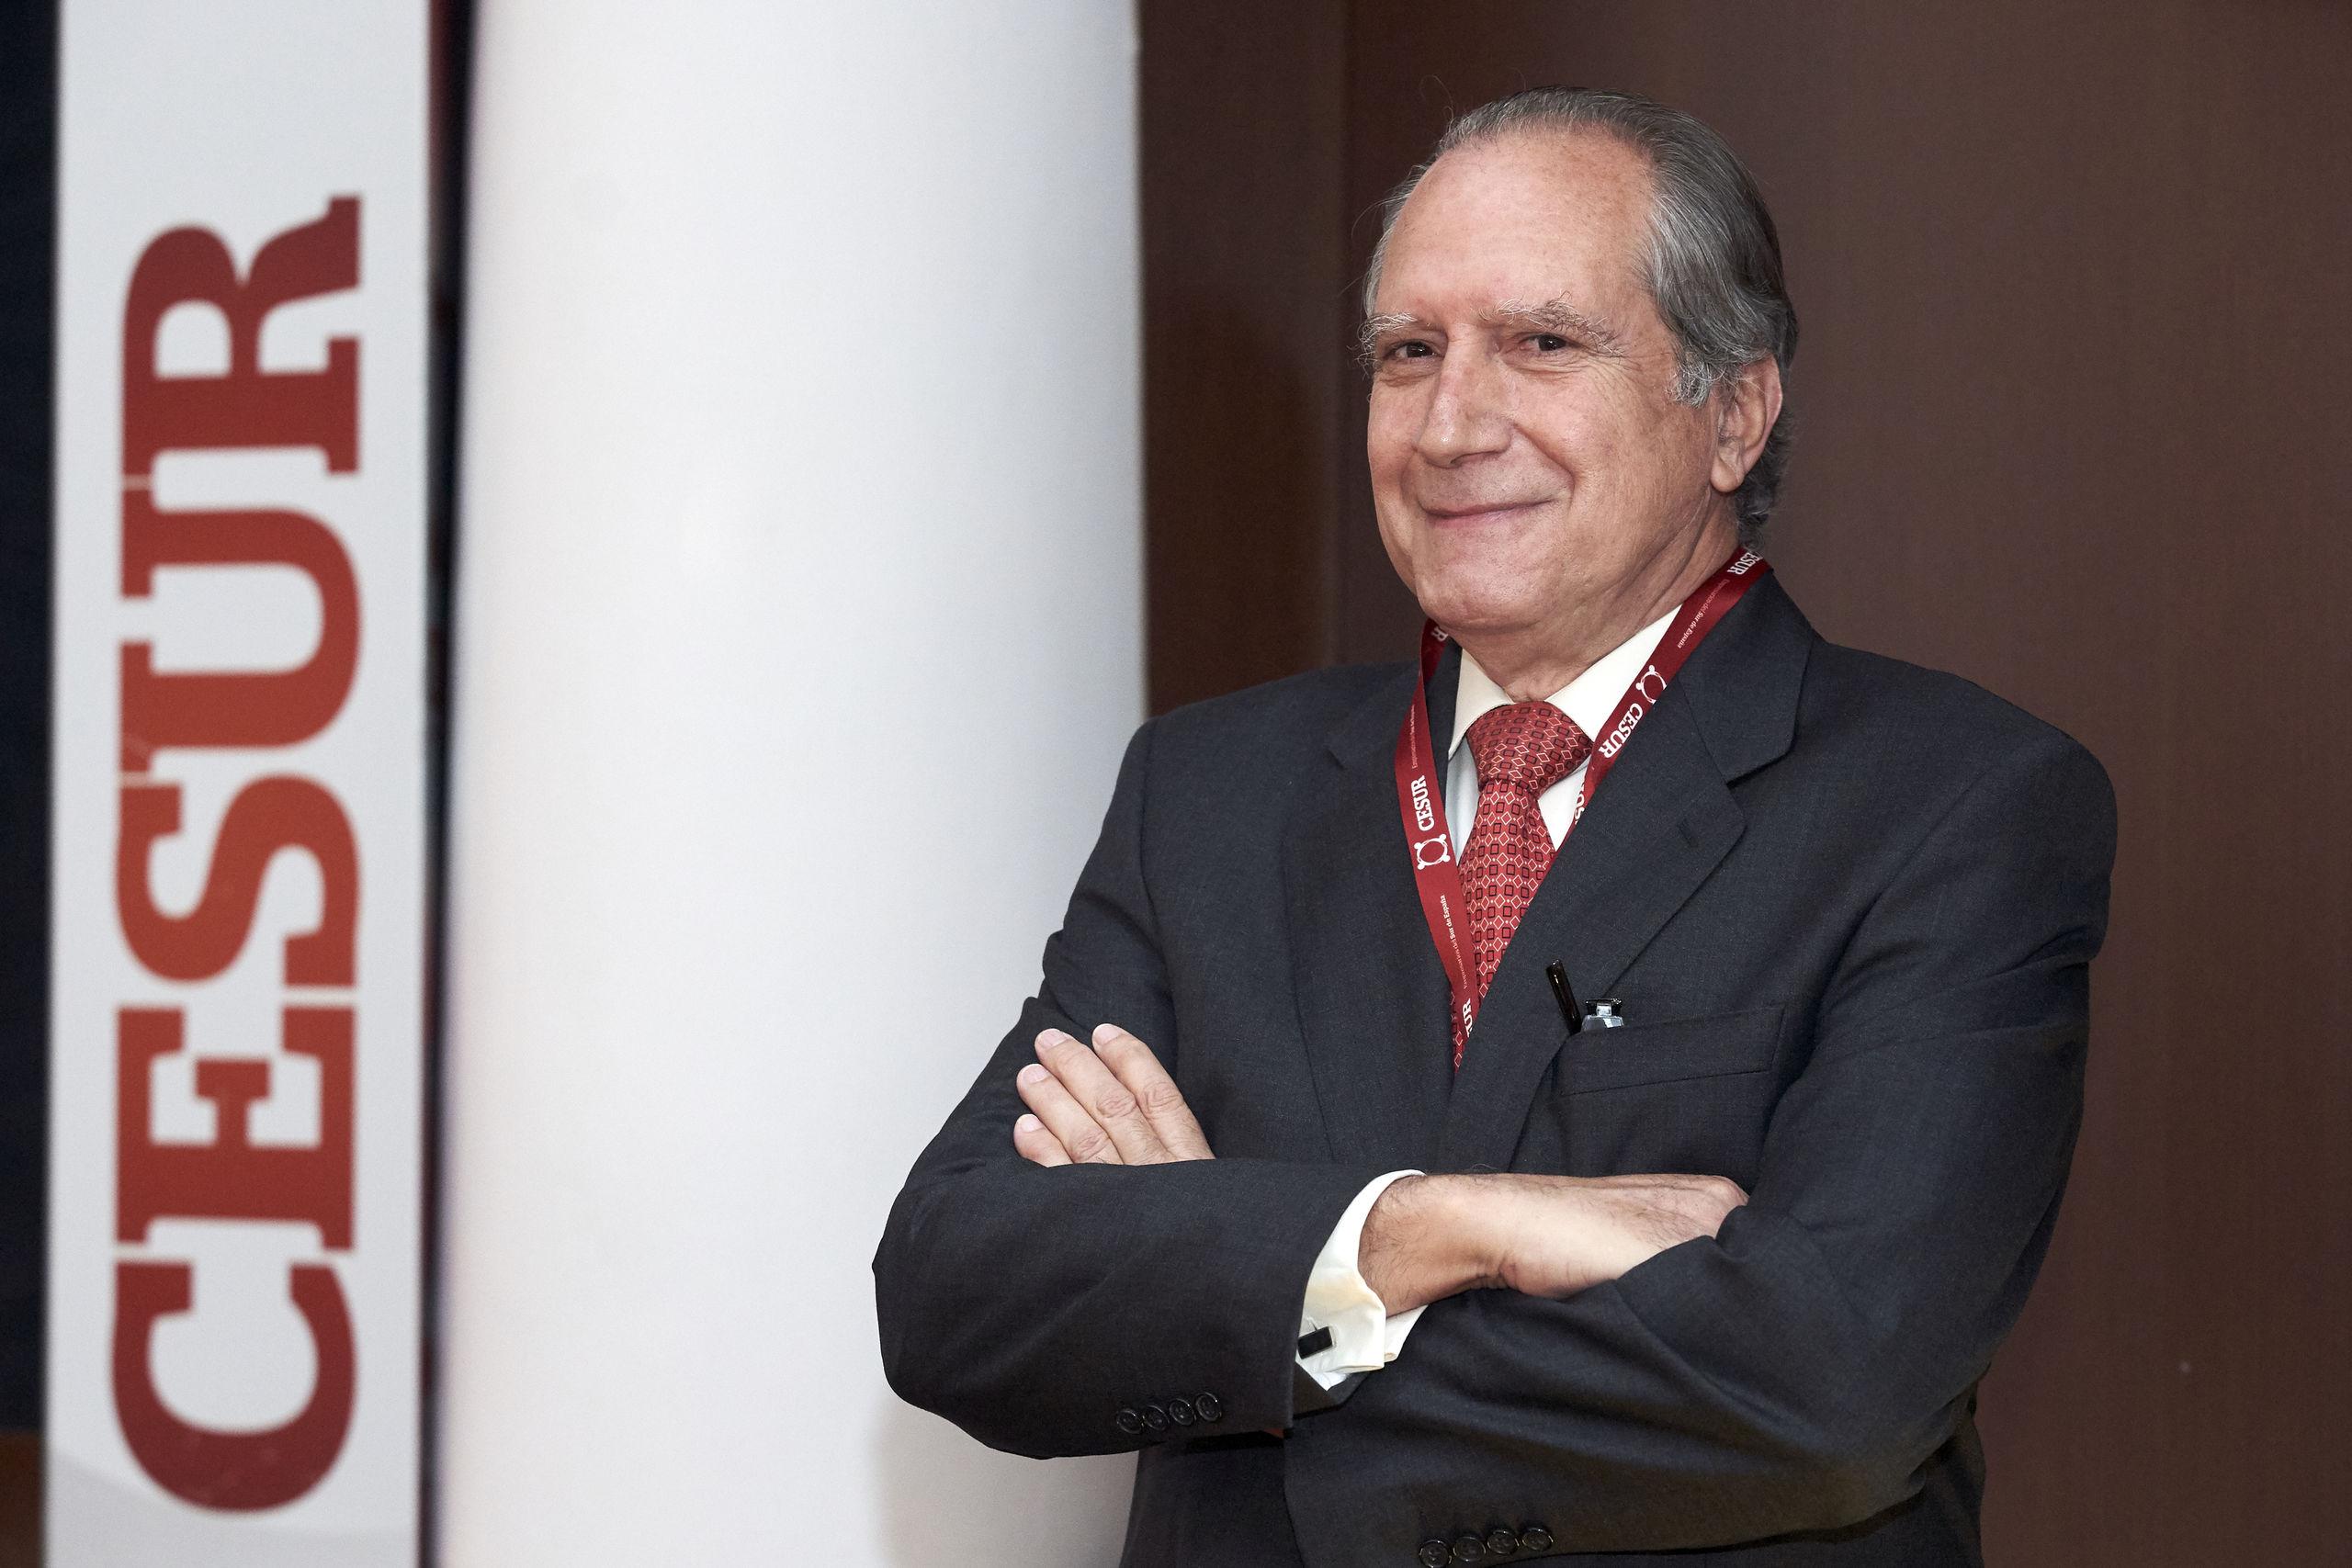 Juan Francisco Iturri